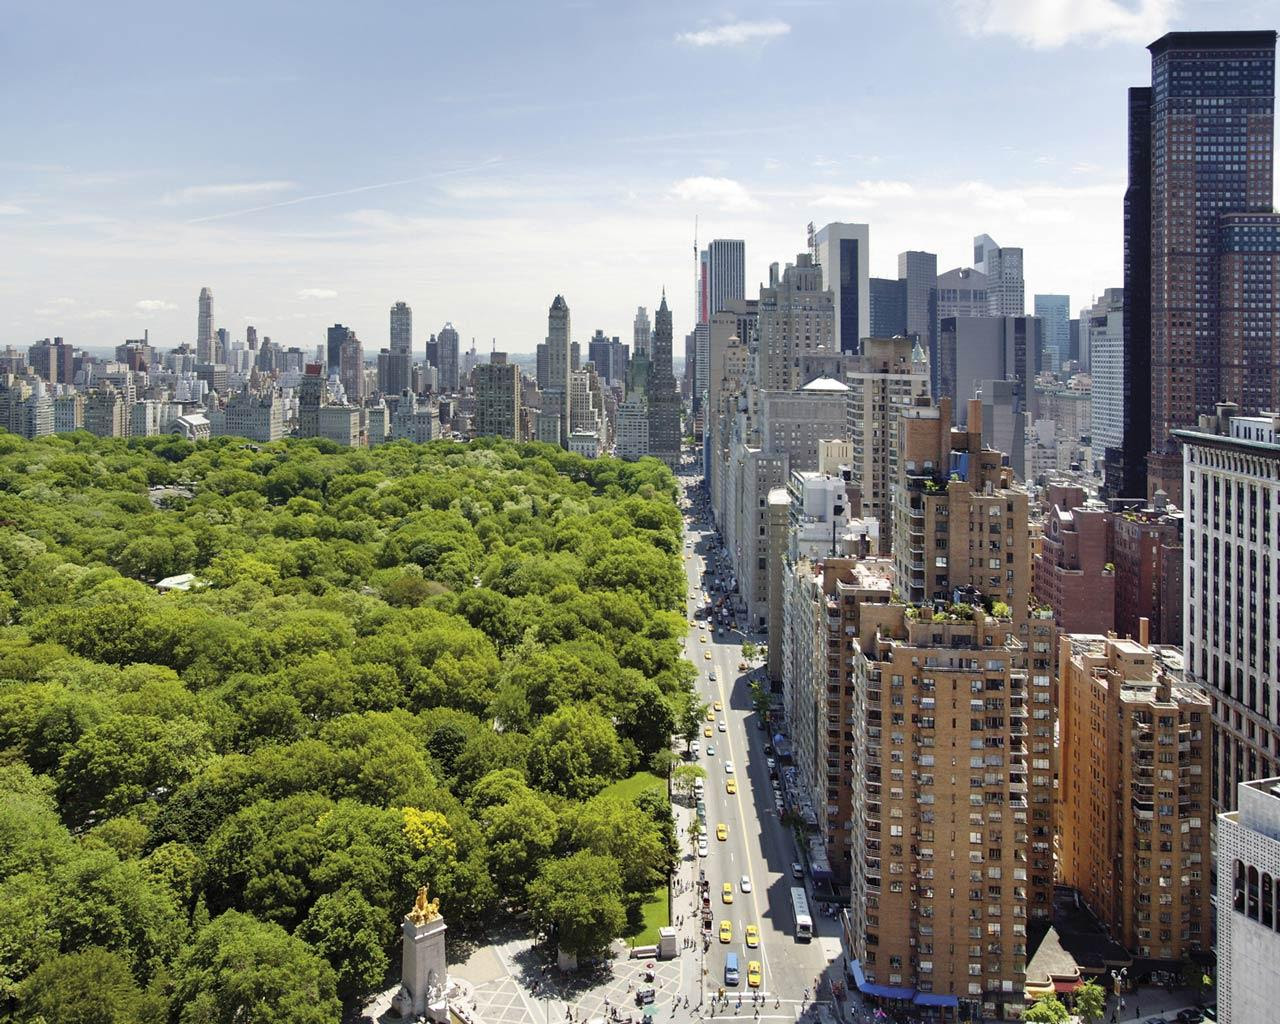 Best City New York Central Park 1280x1024 Wallpaper 3